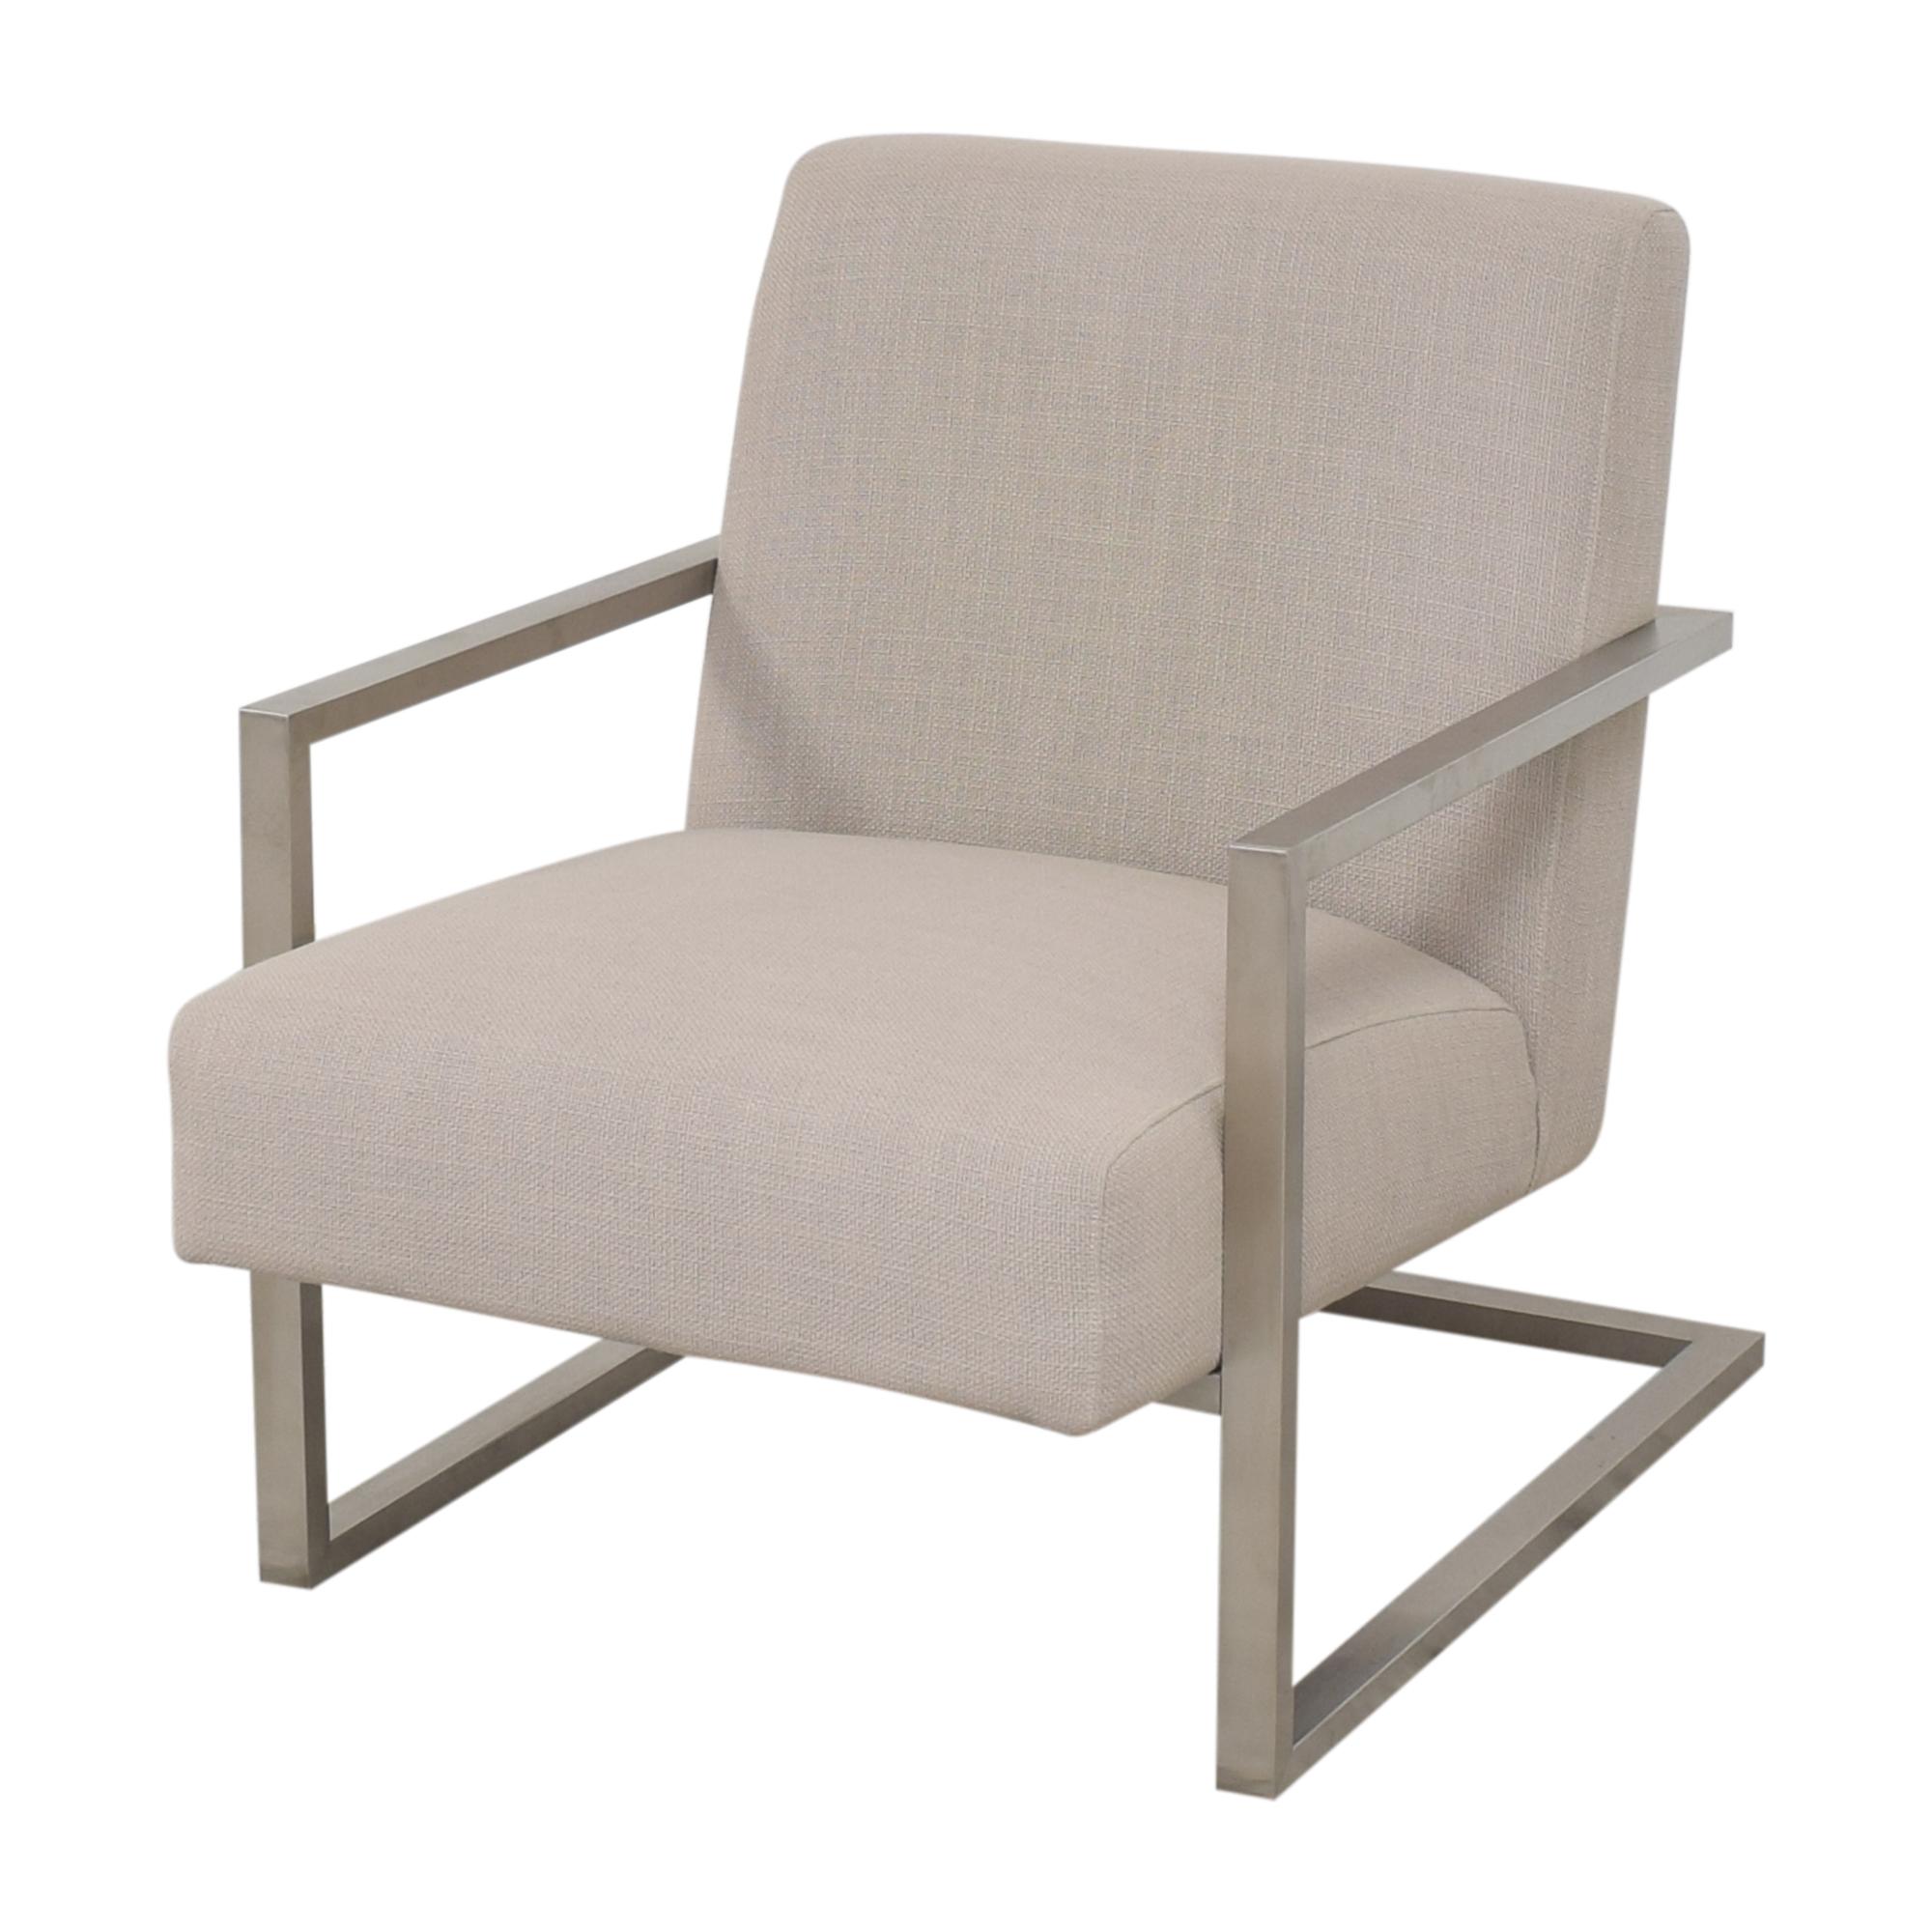 buy Armen Living Skyline Accent Chair Armen Living Chairs